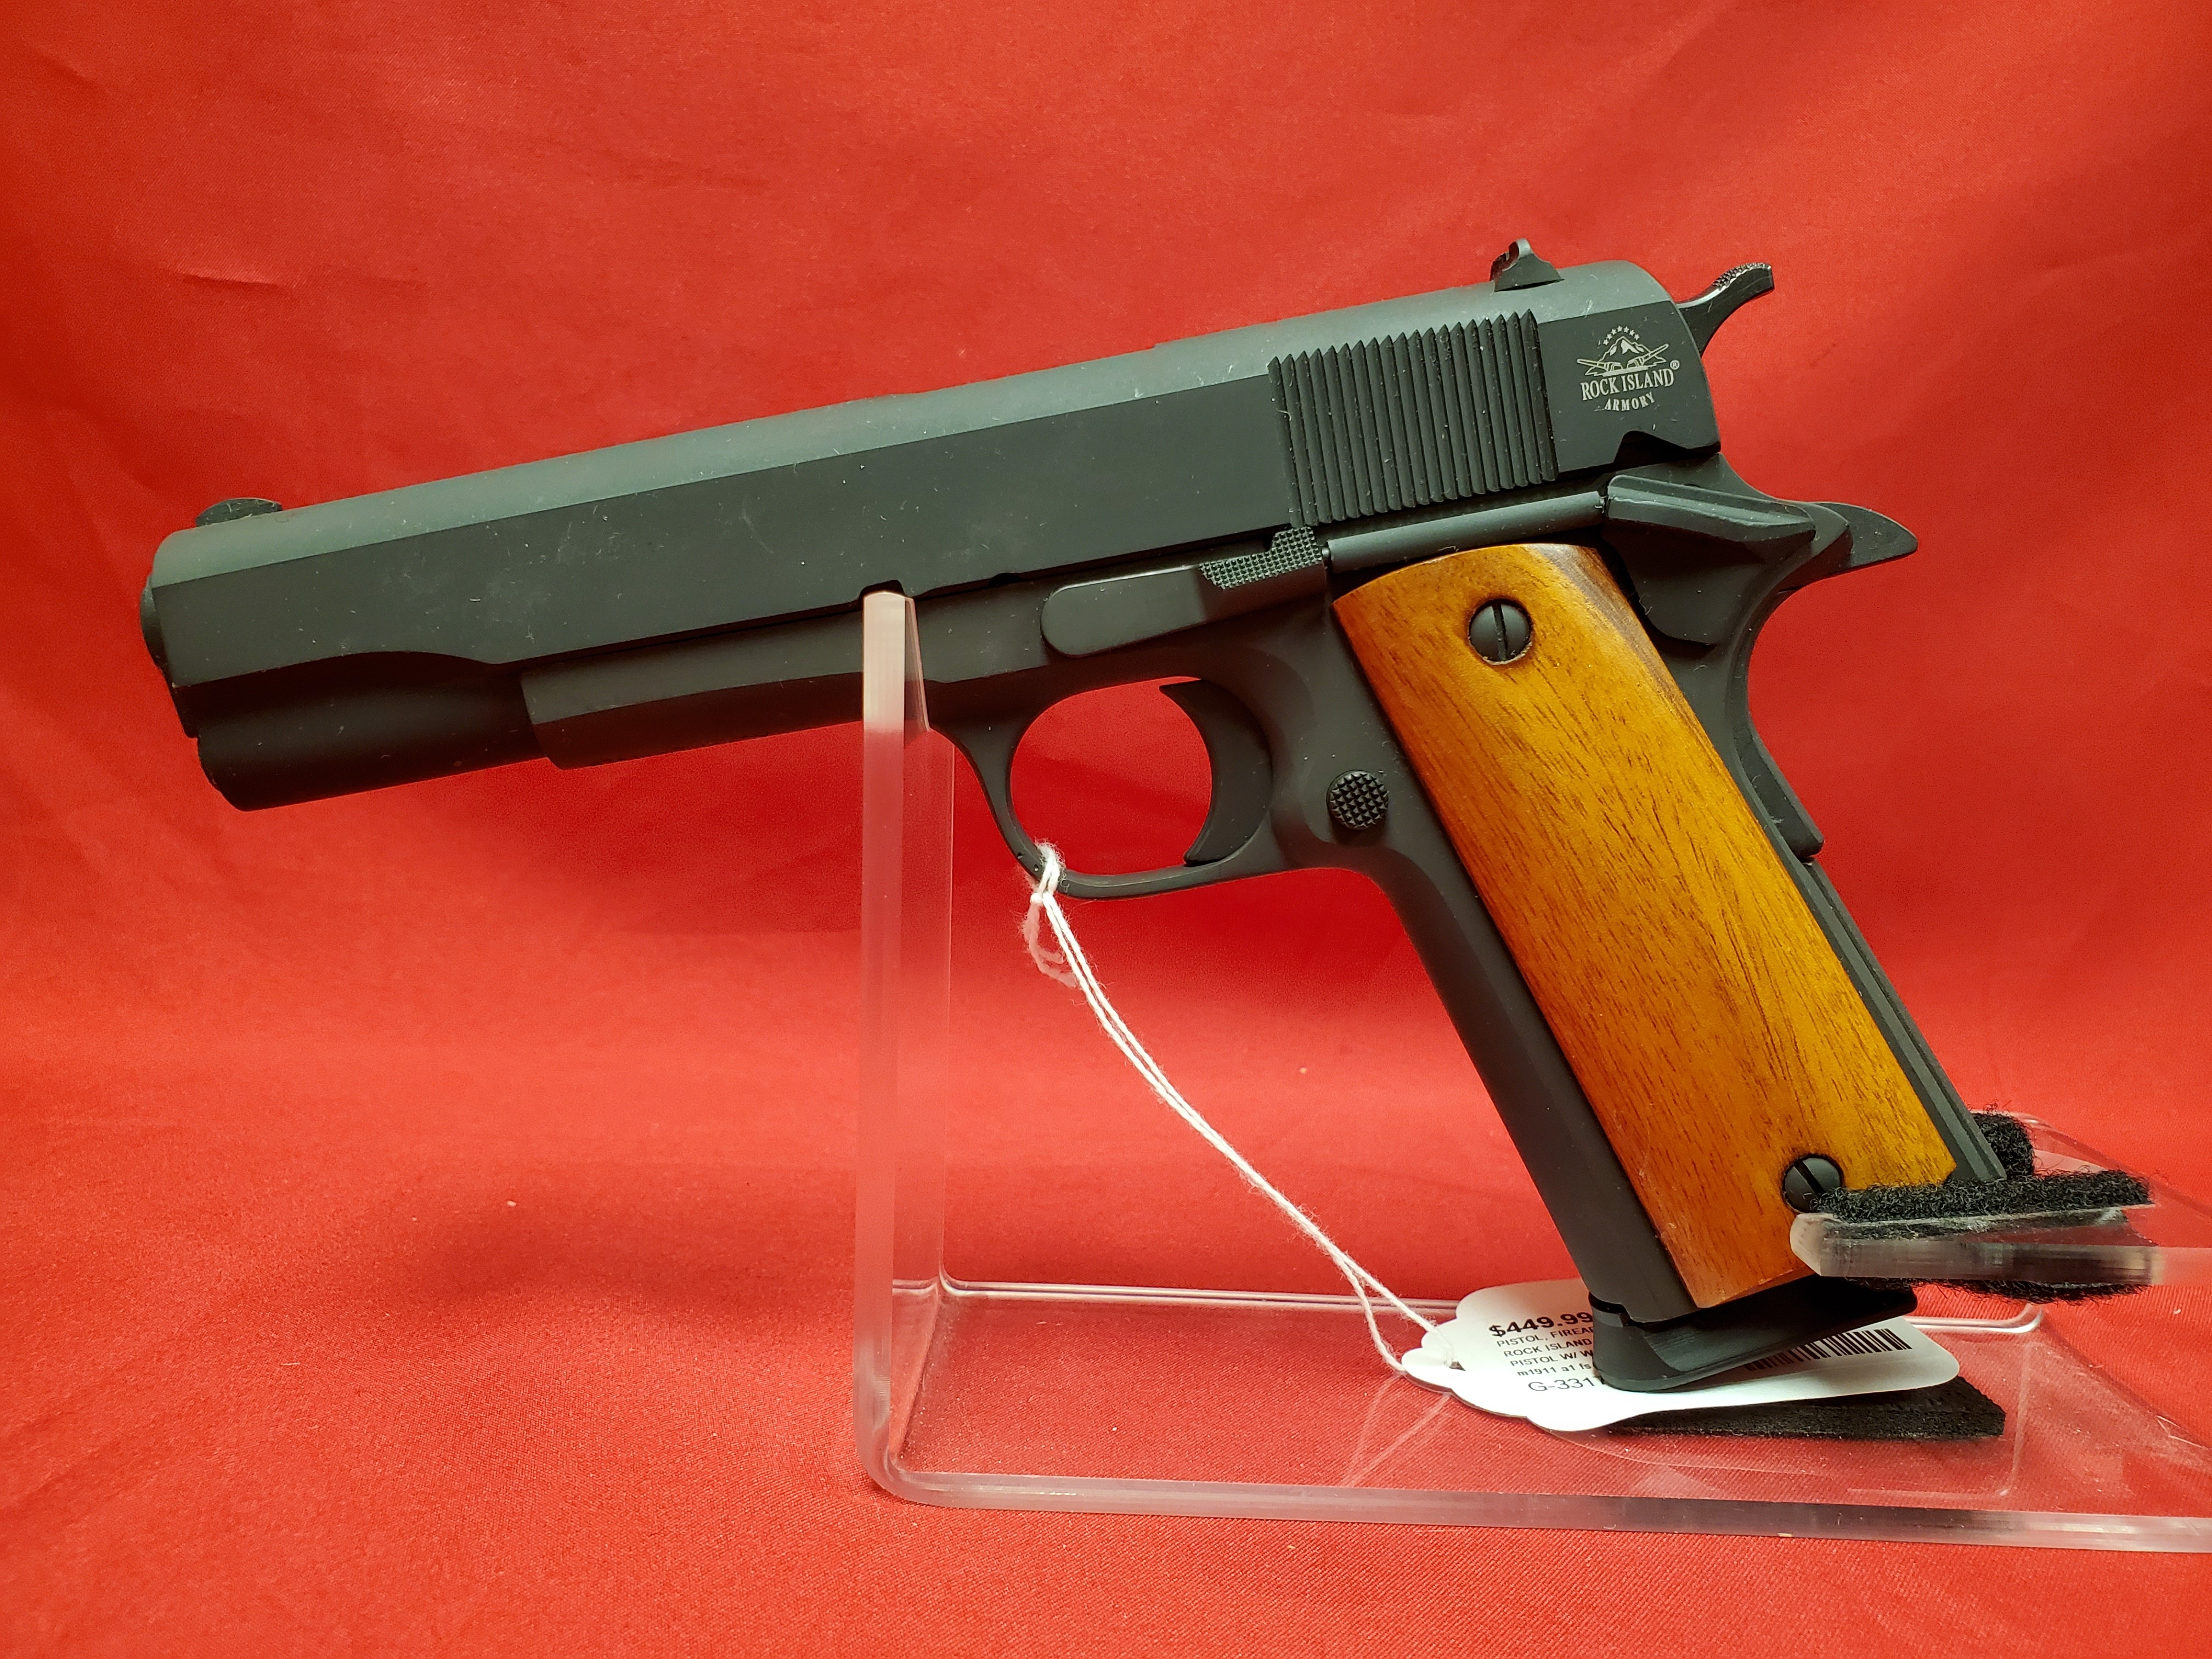 Rock Island 1911 45acp - LIKE NEW!! - GI Standard FS-1 Mag, Lock & Original Case